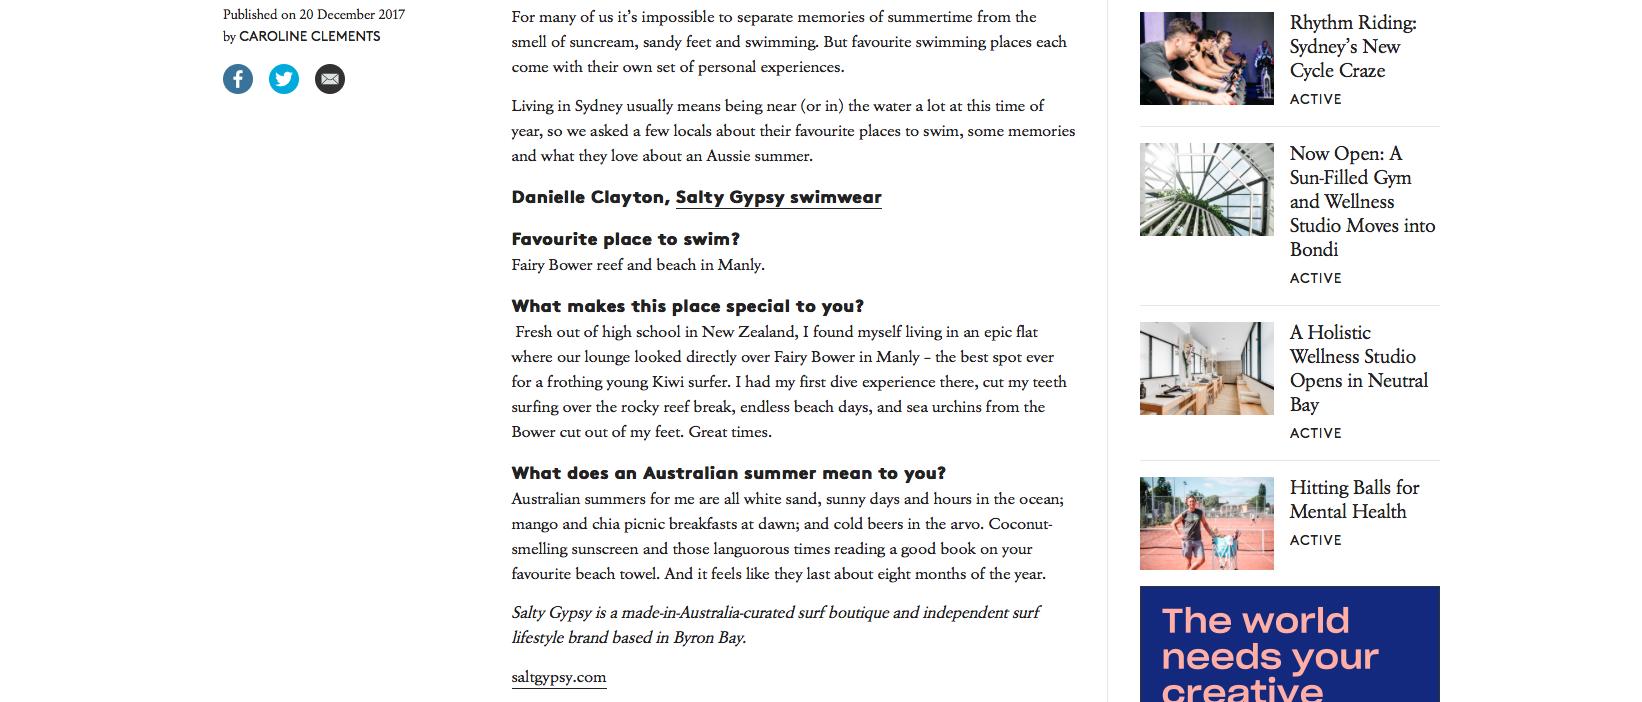 https://www.broadsheet.com.au/sydney/active/article/where-sydney-swims-summer